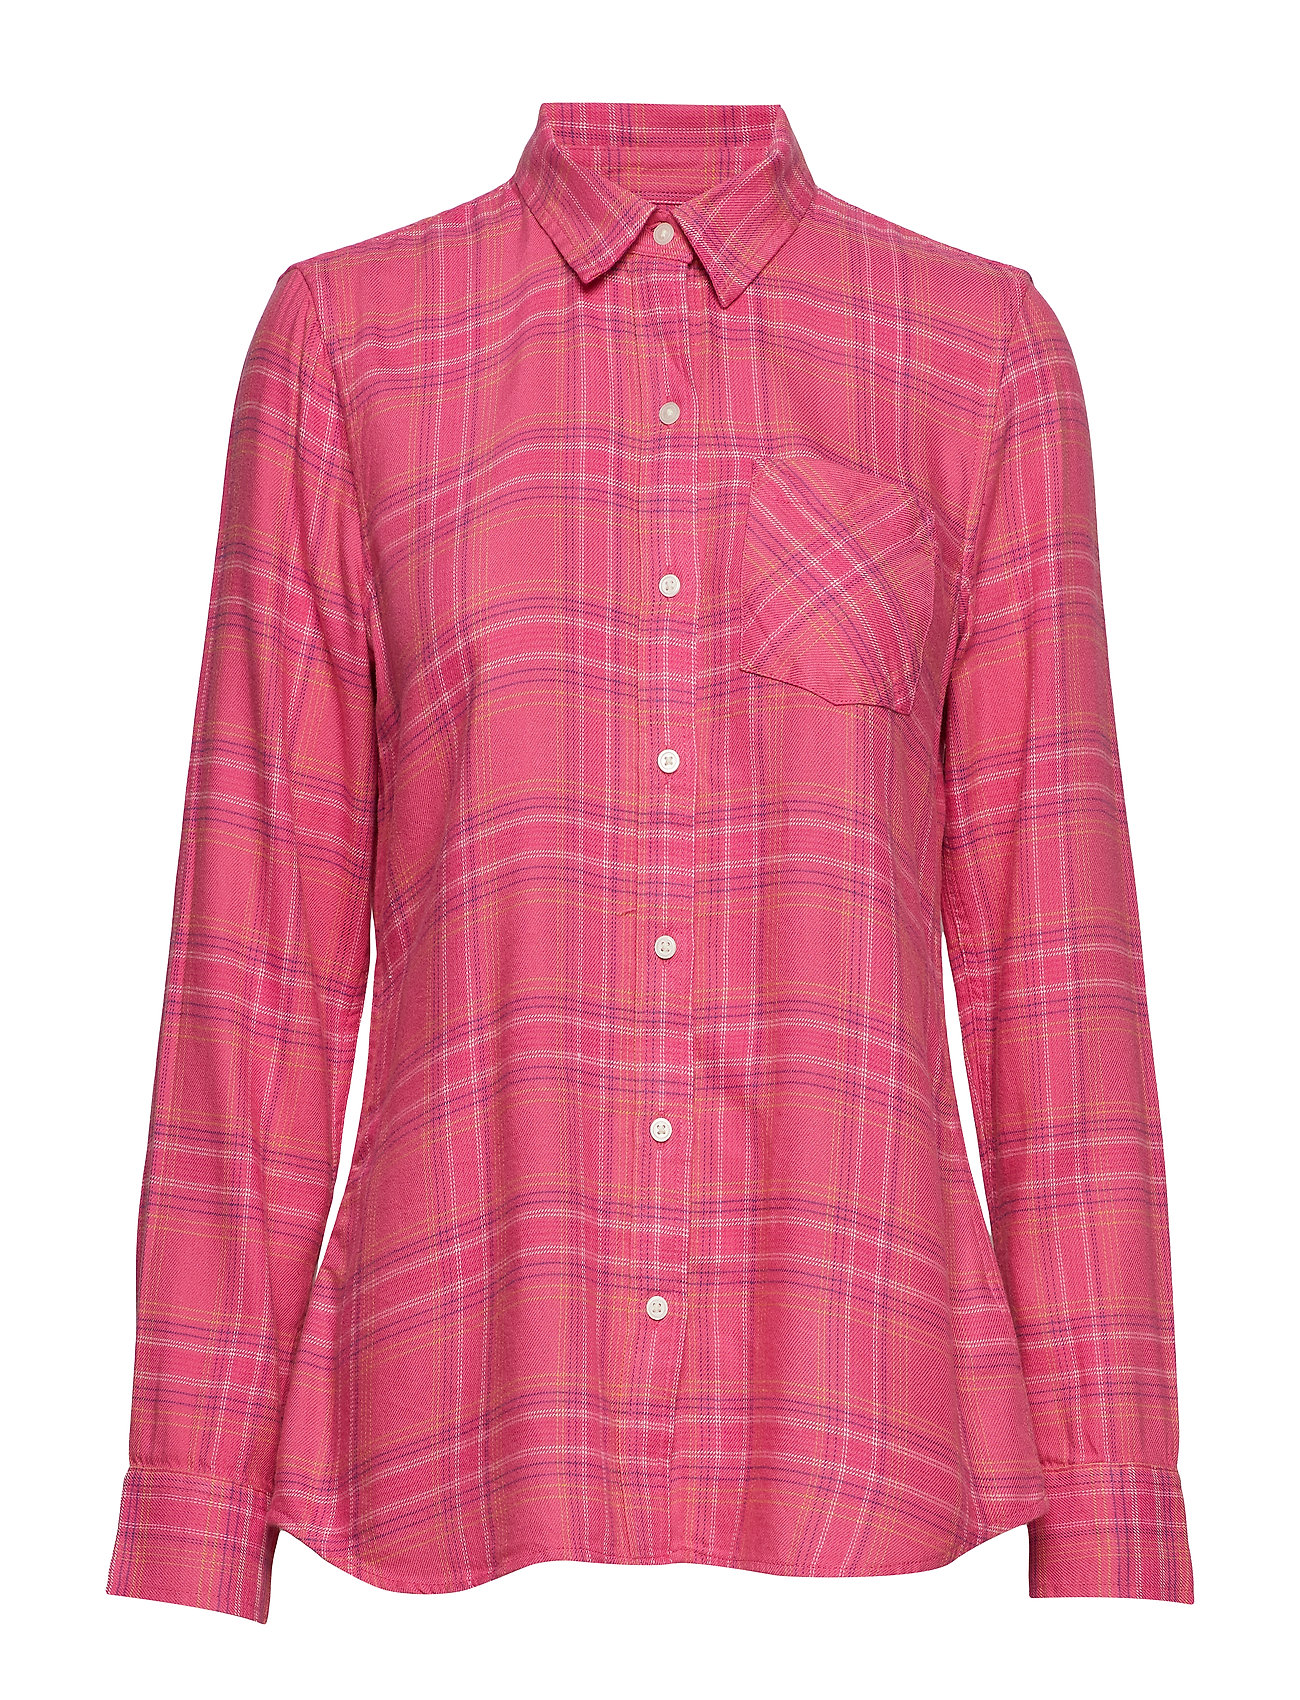 GAP Plaid Flannel Shirt - PINK PLAID COMBO A